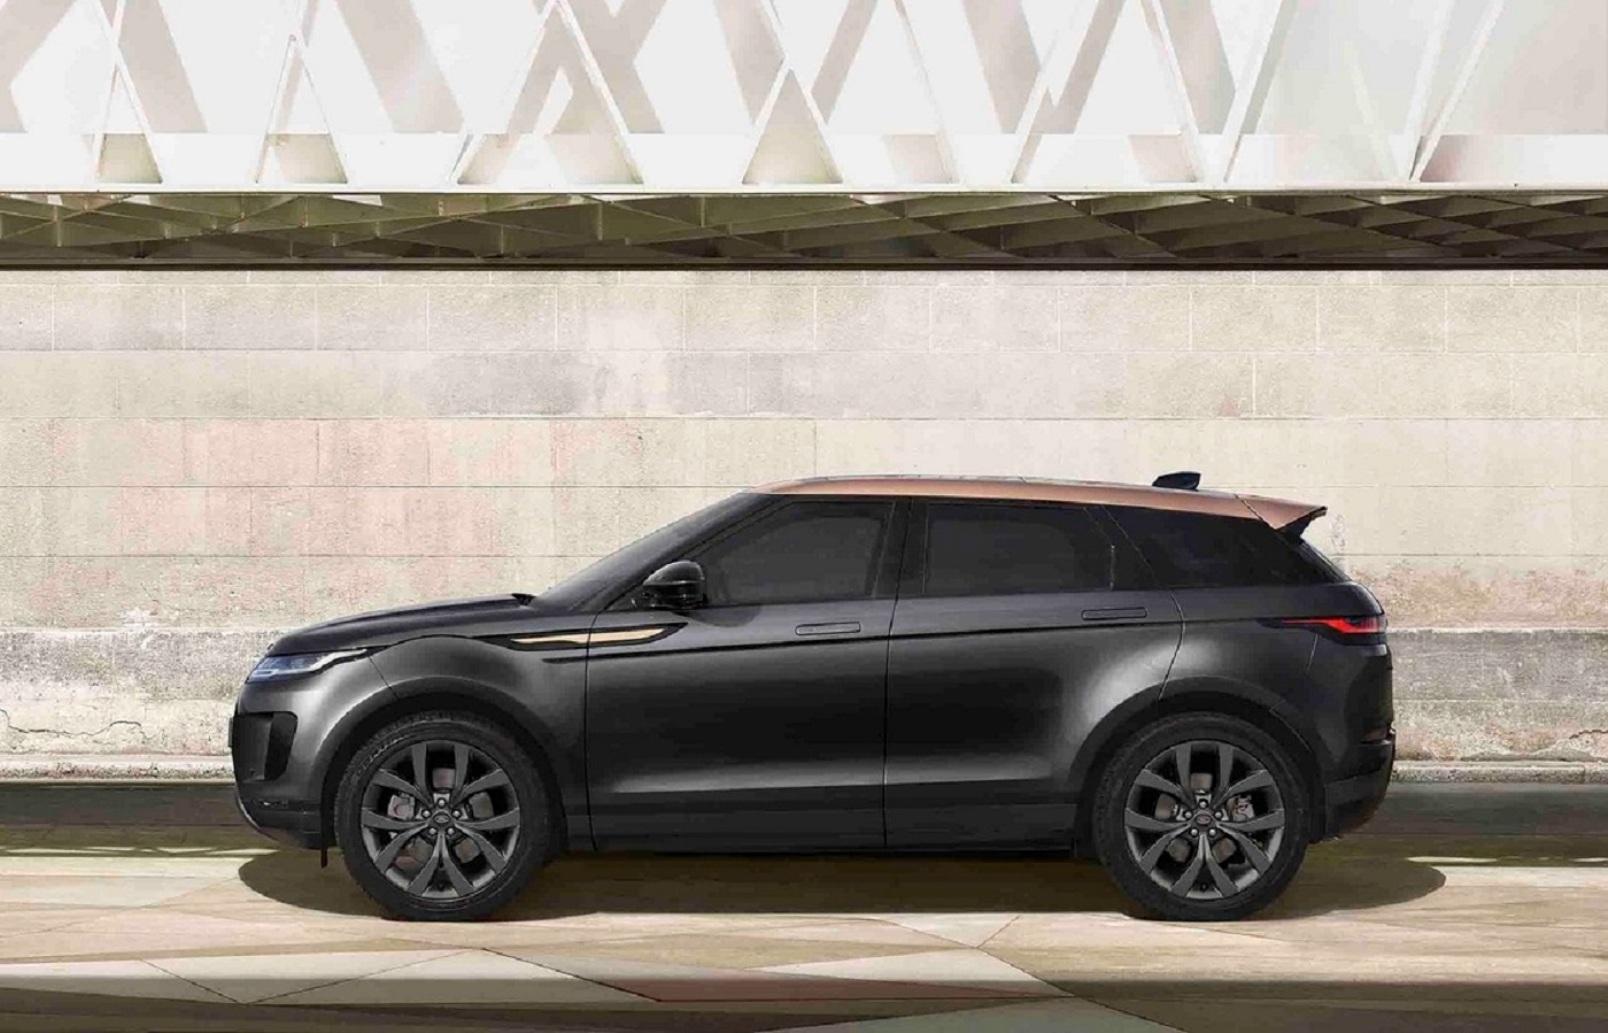 Range Rover Evoque Bronze Collection (1)